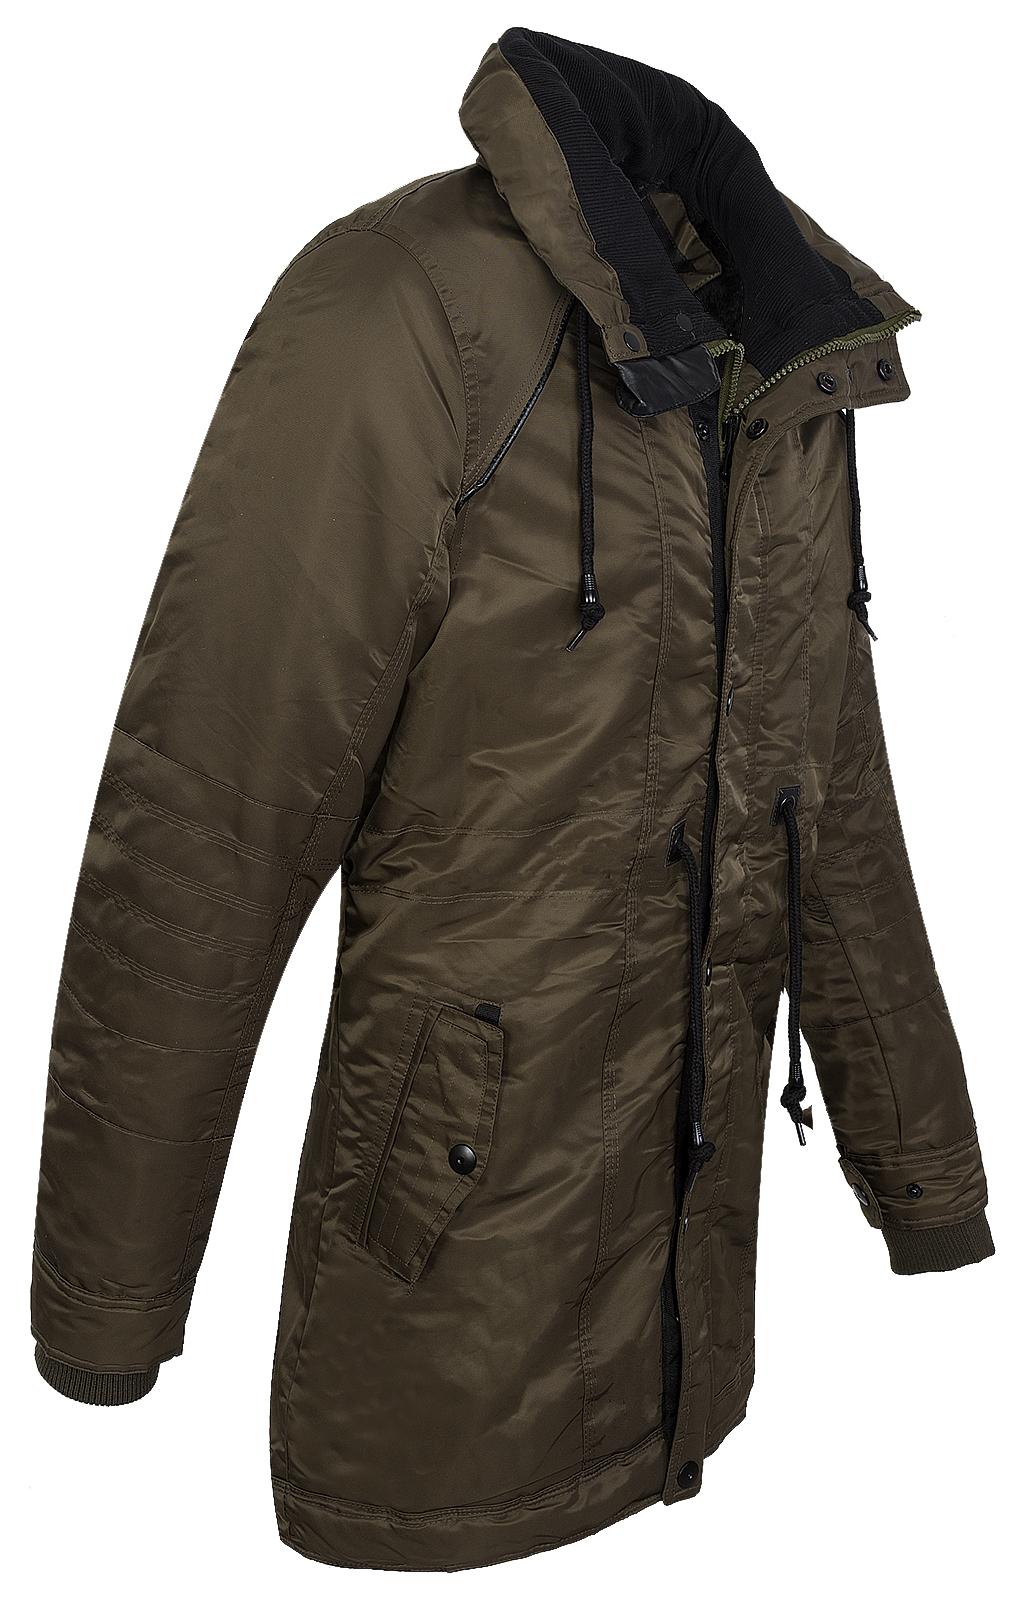 herren winter jacke outdoor mantel funktionsjacke teddyfell futter h 135 s xxl ebay. Black Bedroom Furniture Sets. Home Design Ideas